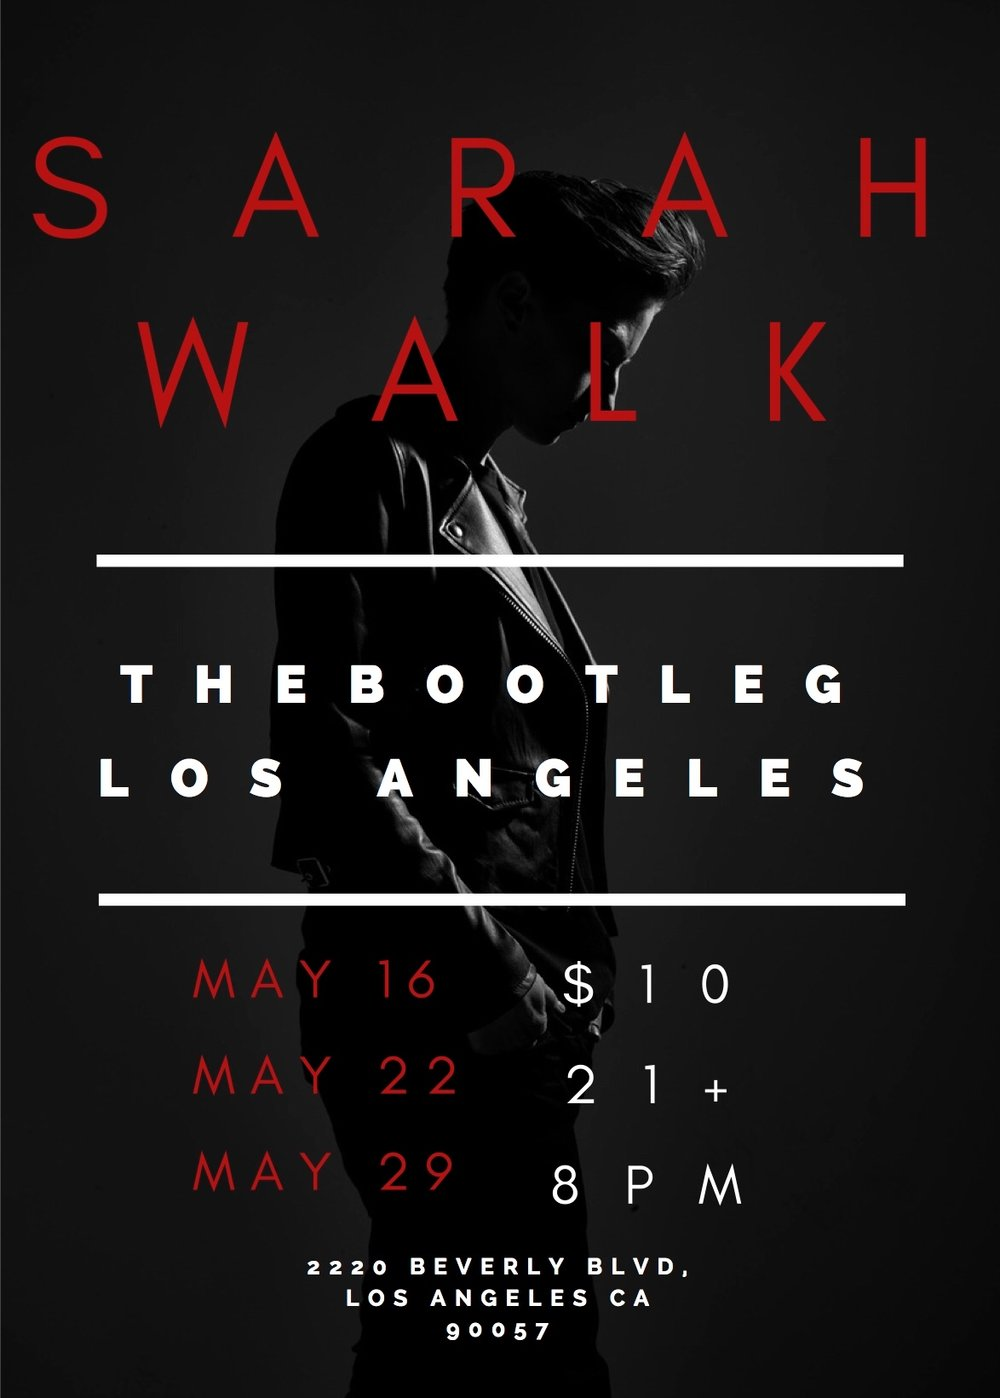 sarahwalk-bootleg posterfinal.jpg